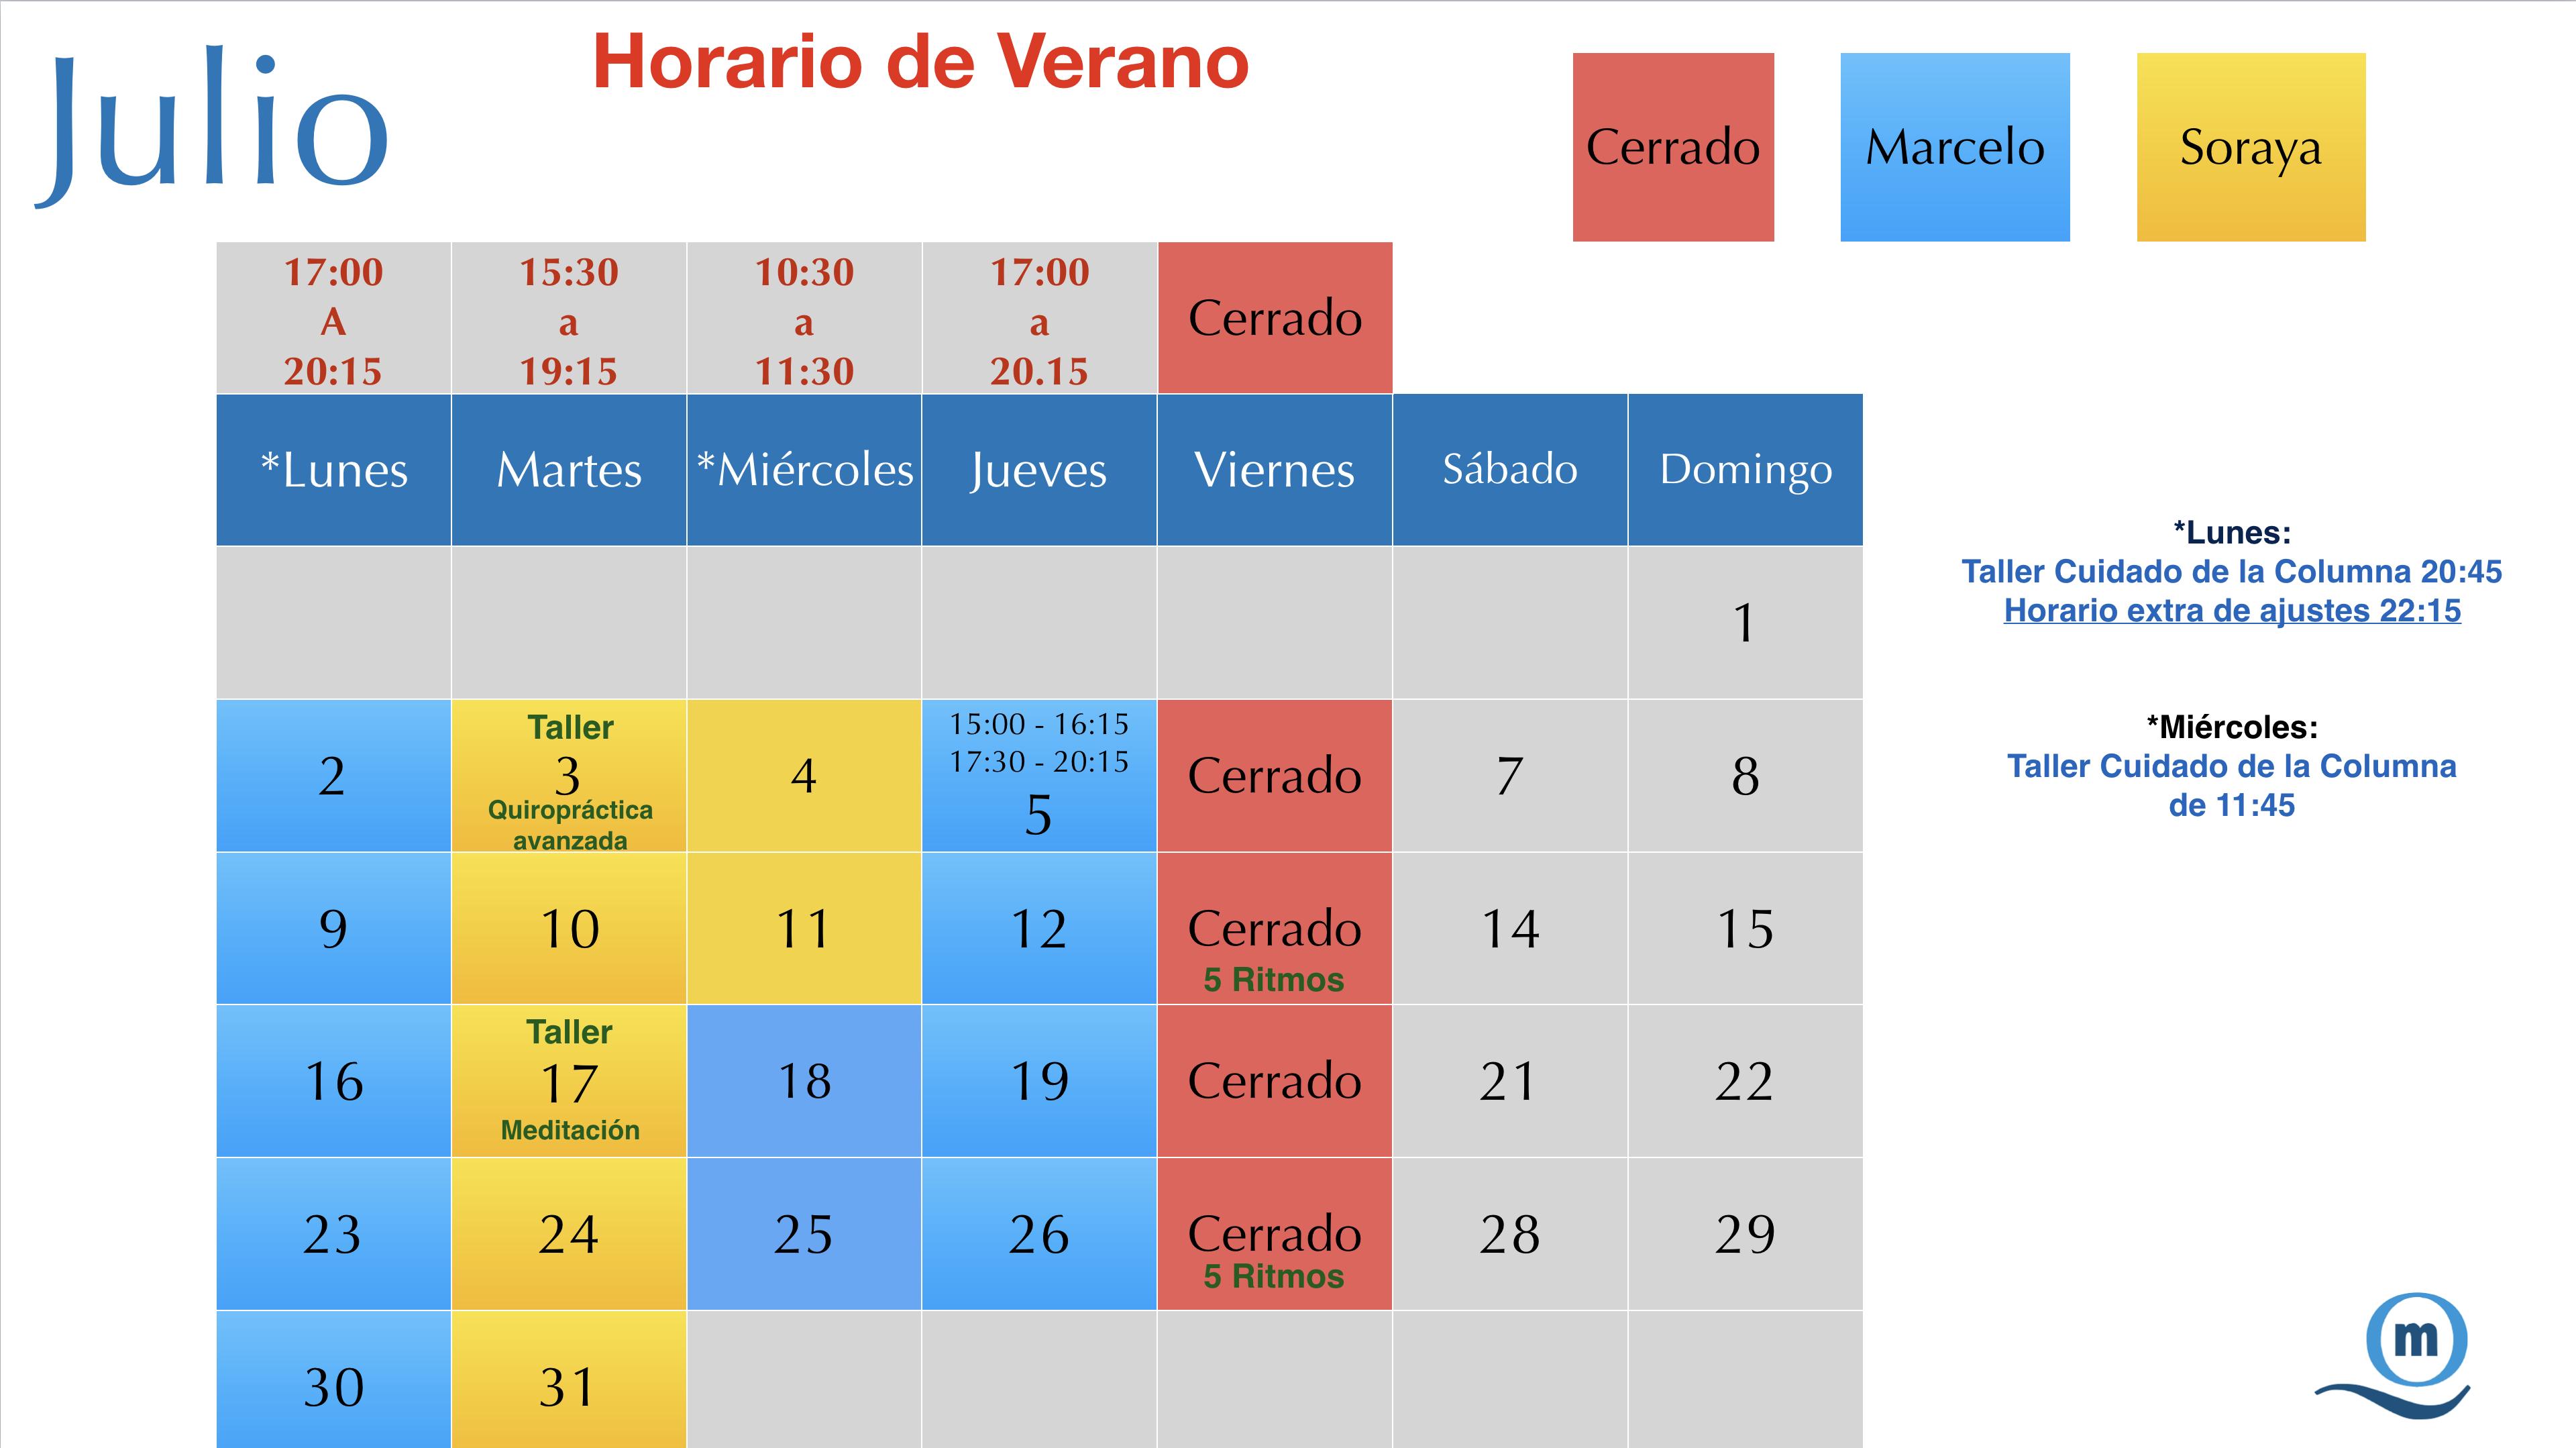 Horarios Verano 2018